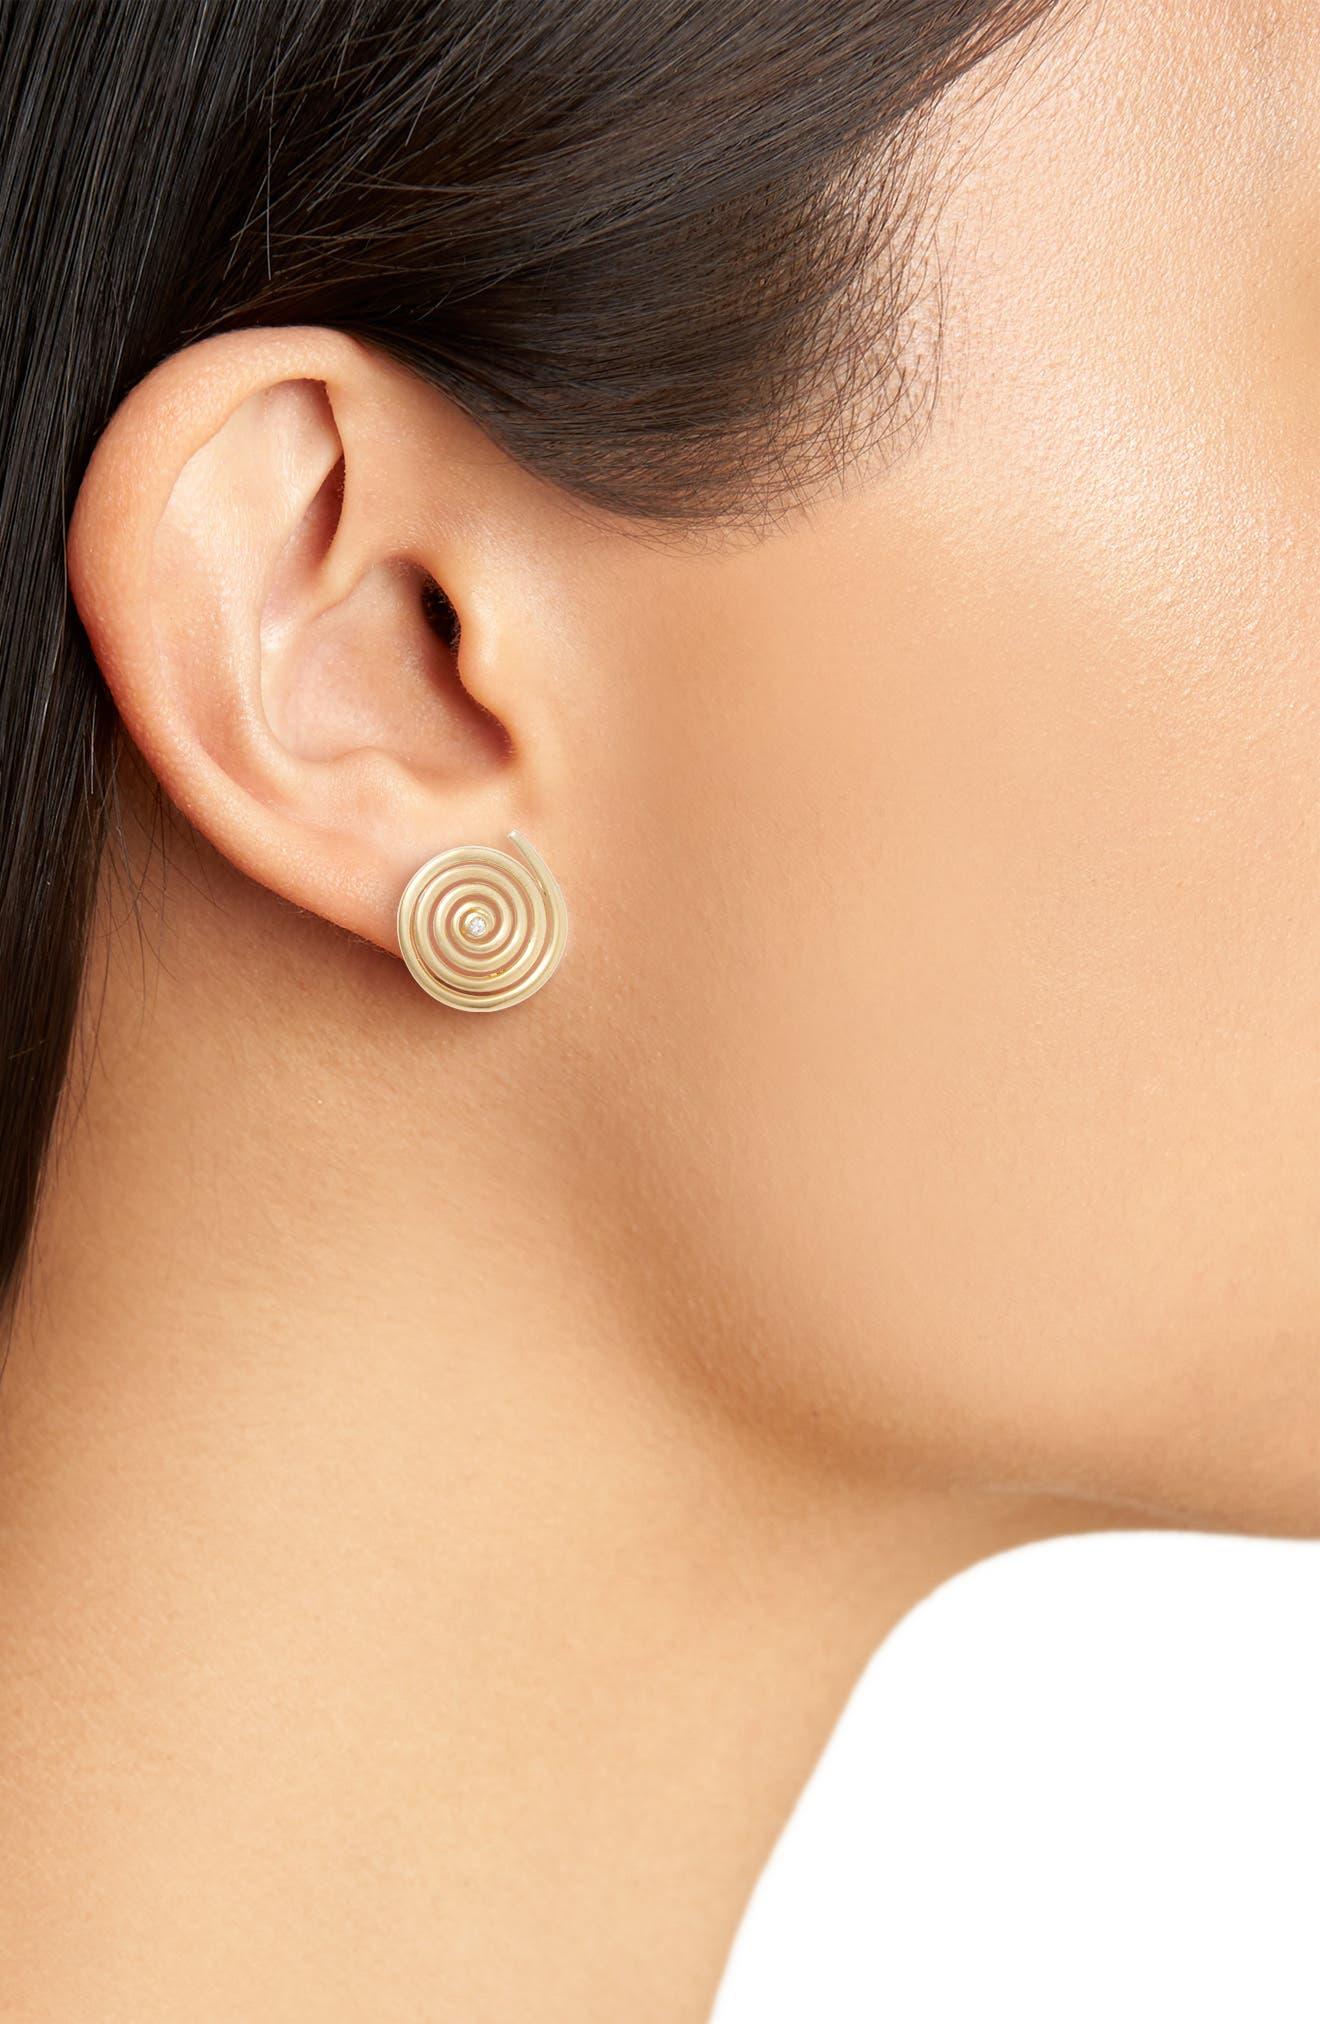 Della White Topaz Stud Earrings,                             Alternate thumbnail 2, color,                             Yellow Gold